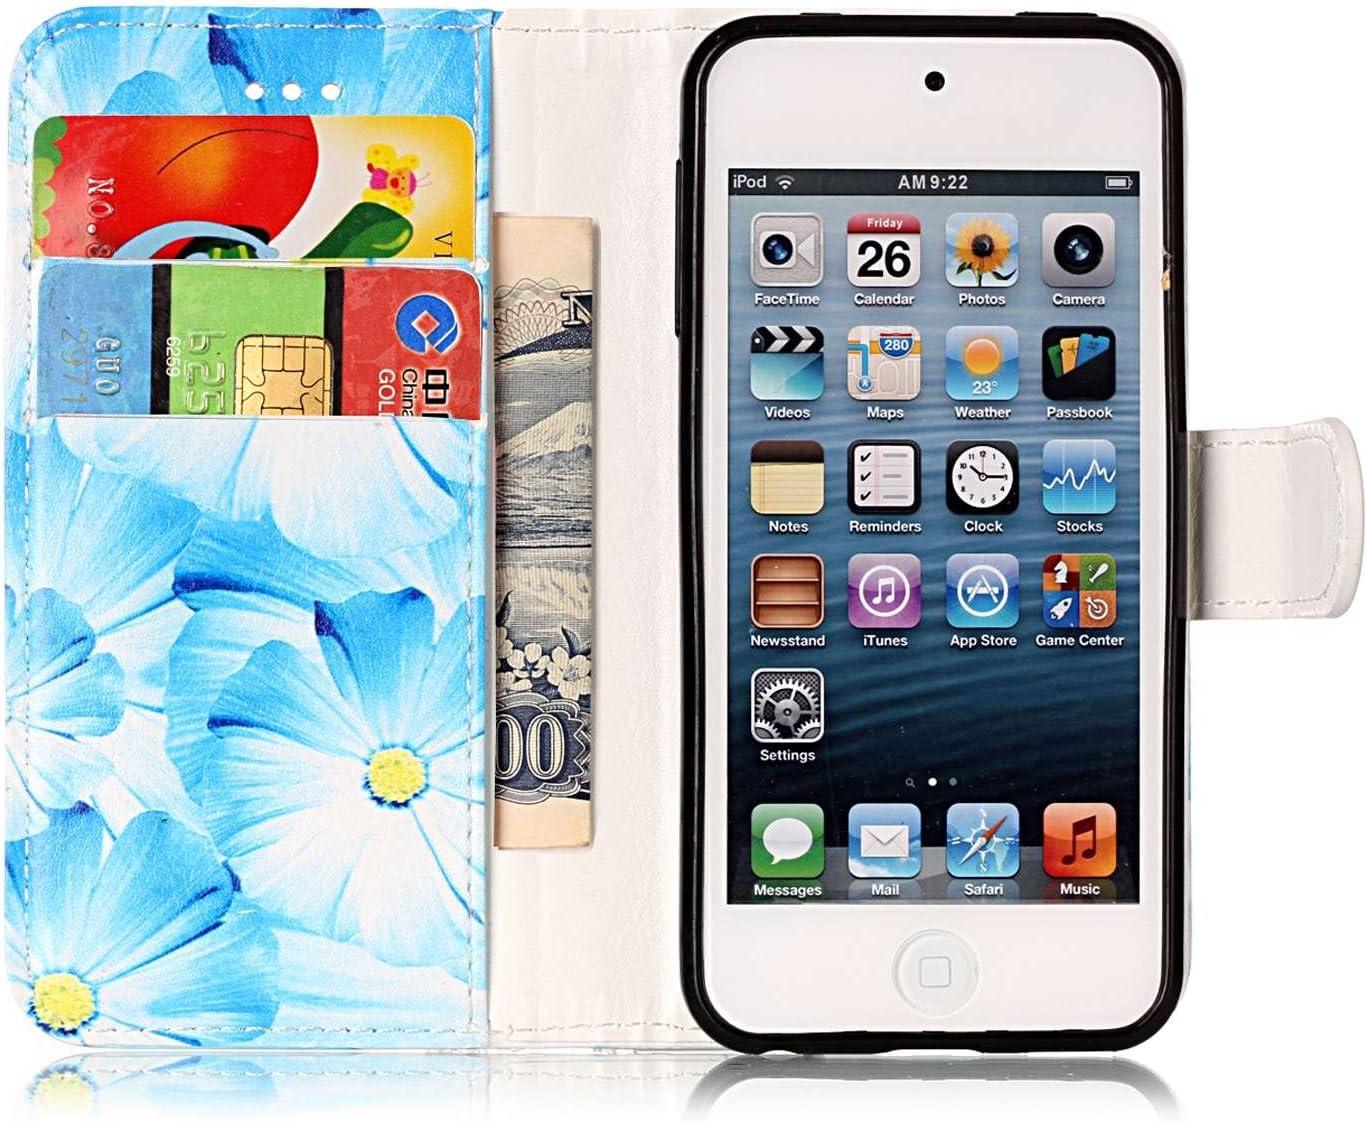 Kompatibel mit iPod Touch 5 H/ülle,iPod Touch 6 H/ülle,iPod Touch 5 6,JAWSEU Wei/ß Marmor Muster PU Leder H/ülle Schutzh/ülle Flip Case Brieftasche Tasche Handyh/ülle Klapph/ülle f/ür iPod Touch 5//6